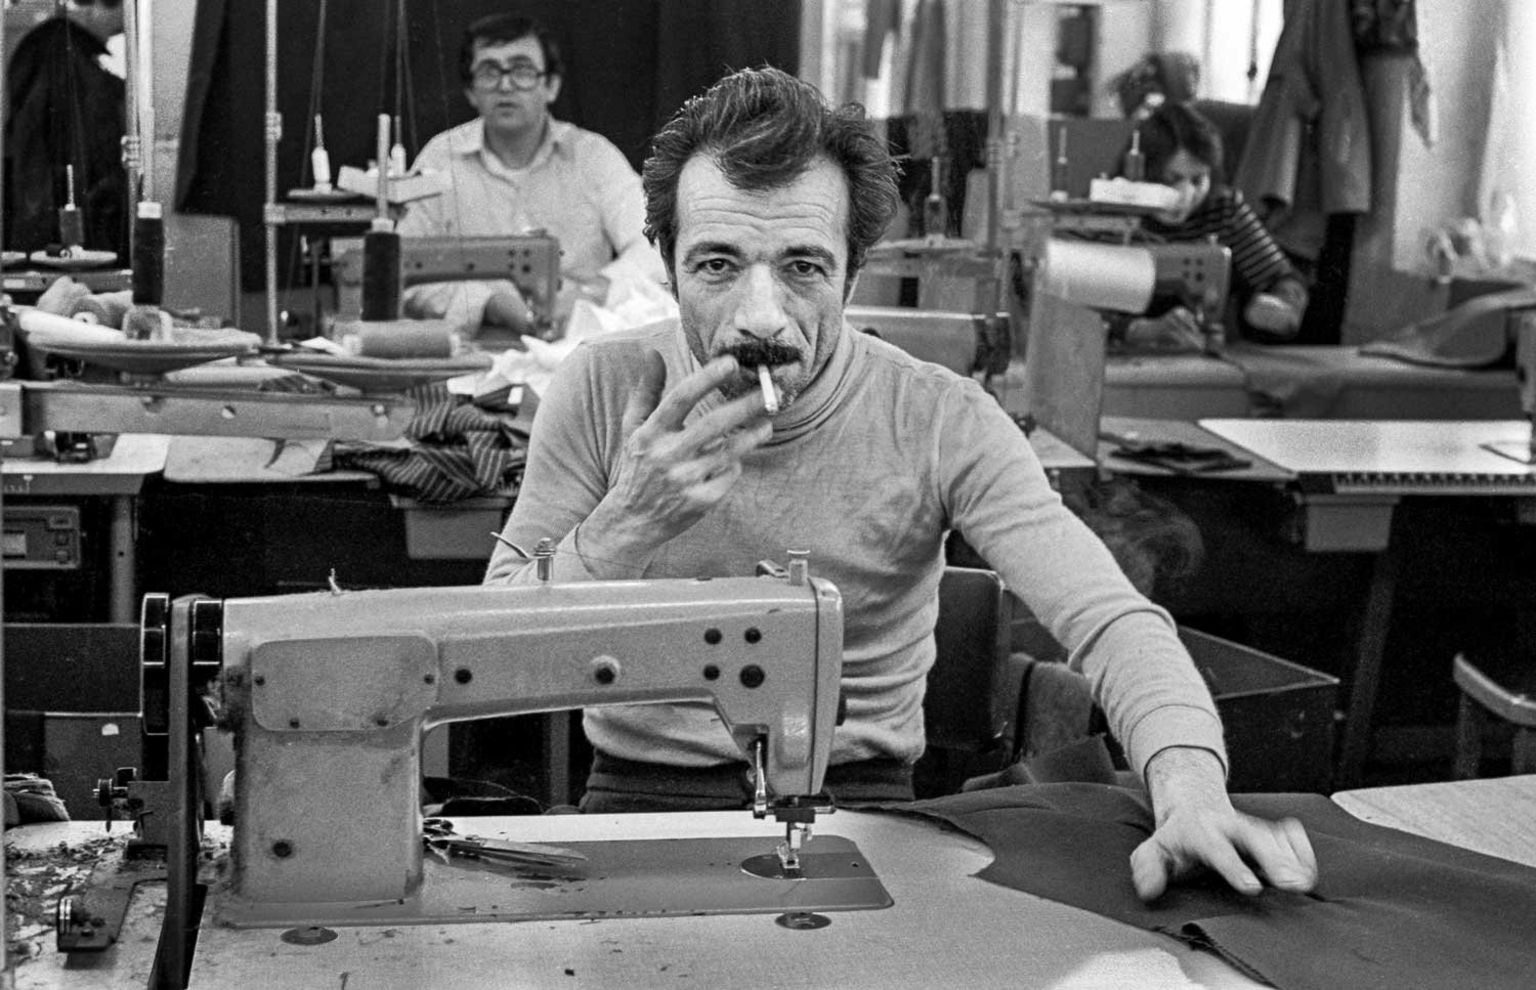 Garment factory, Shacklewell Lane, 1981